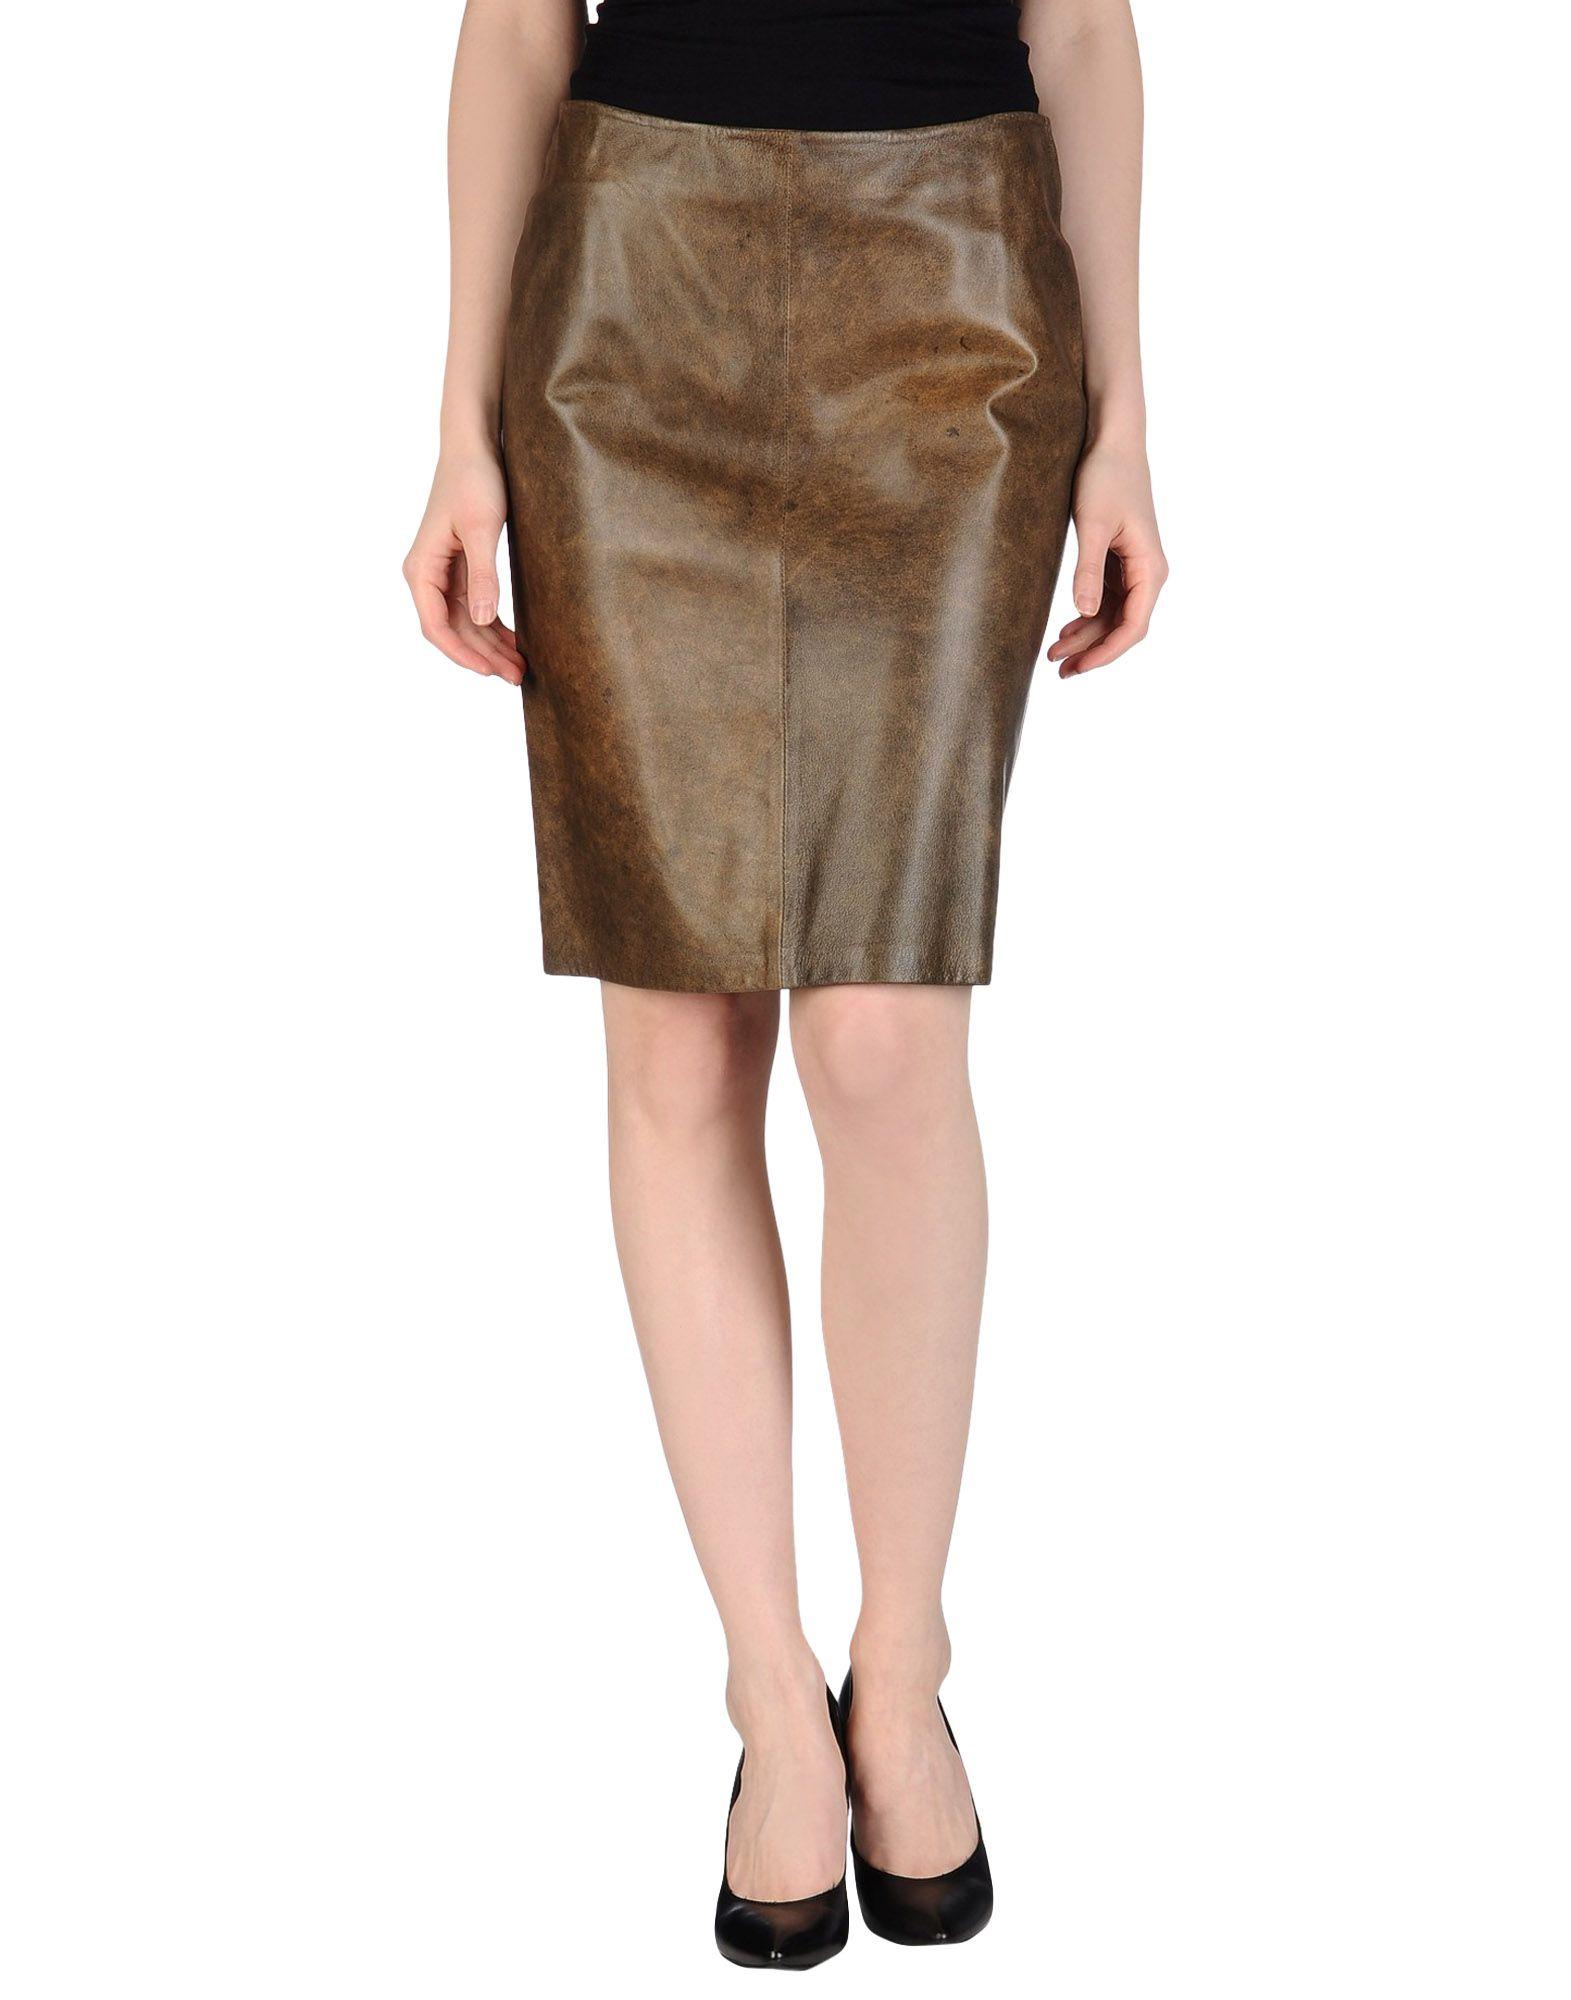 MARIELLA BURANI Damen Lederrock Farbe Khaki Größe 4 - broschei